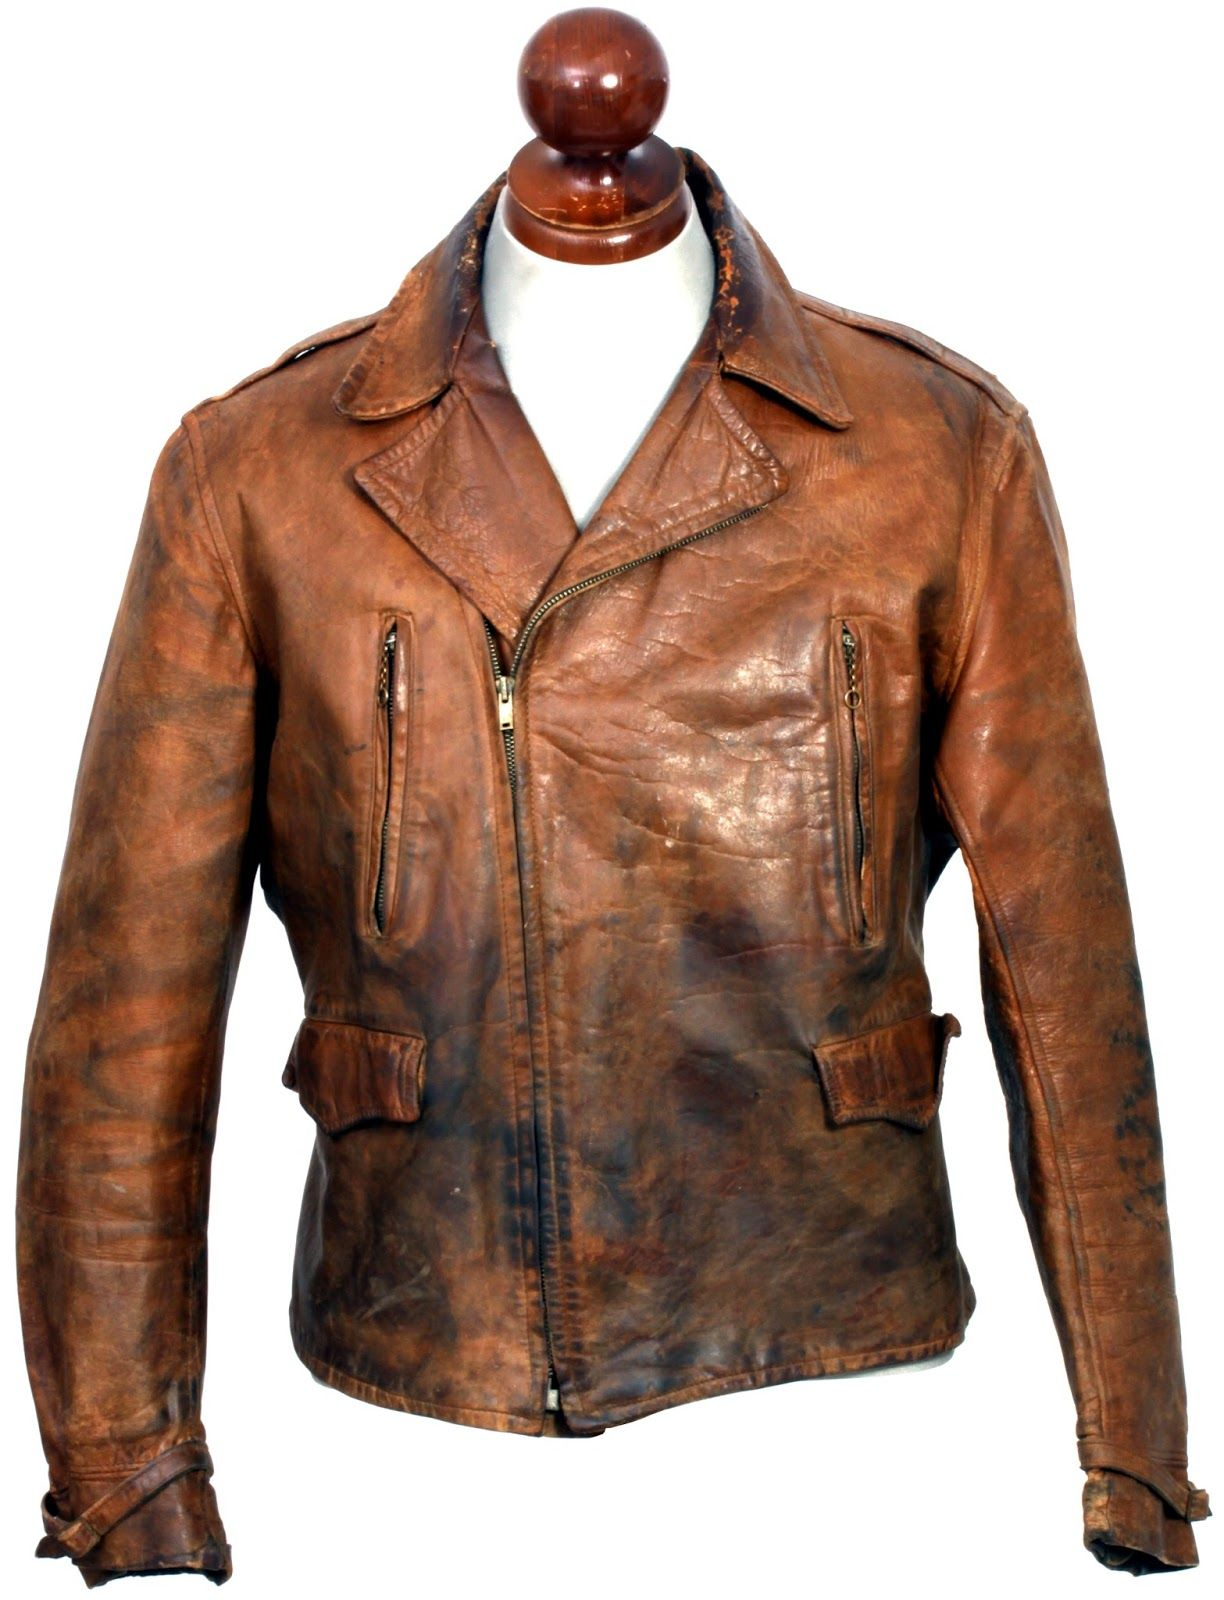 1238ea4d8 Monarch aviator-style half-belt leather jacket. Circa late 1930s ...